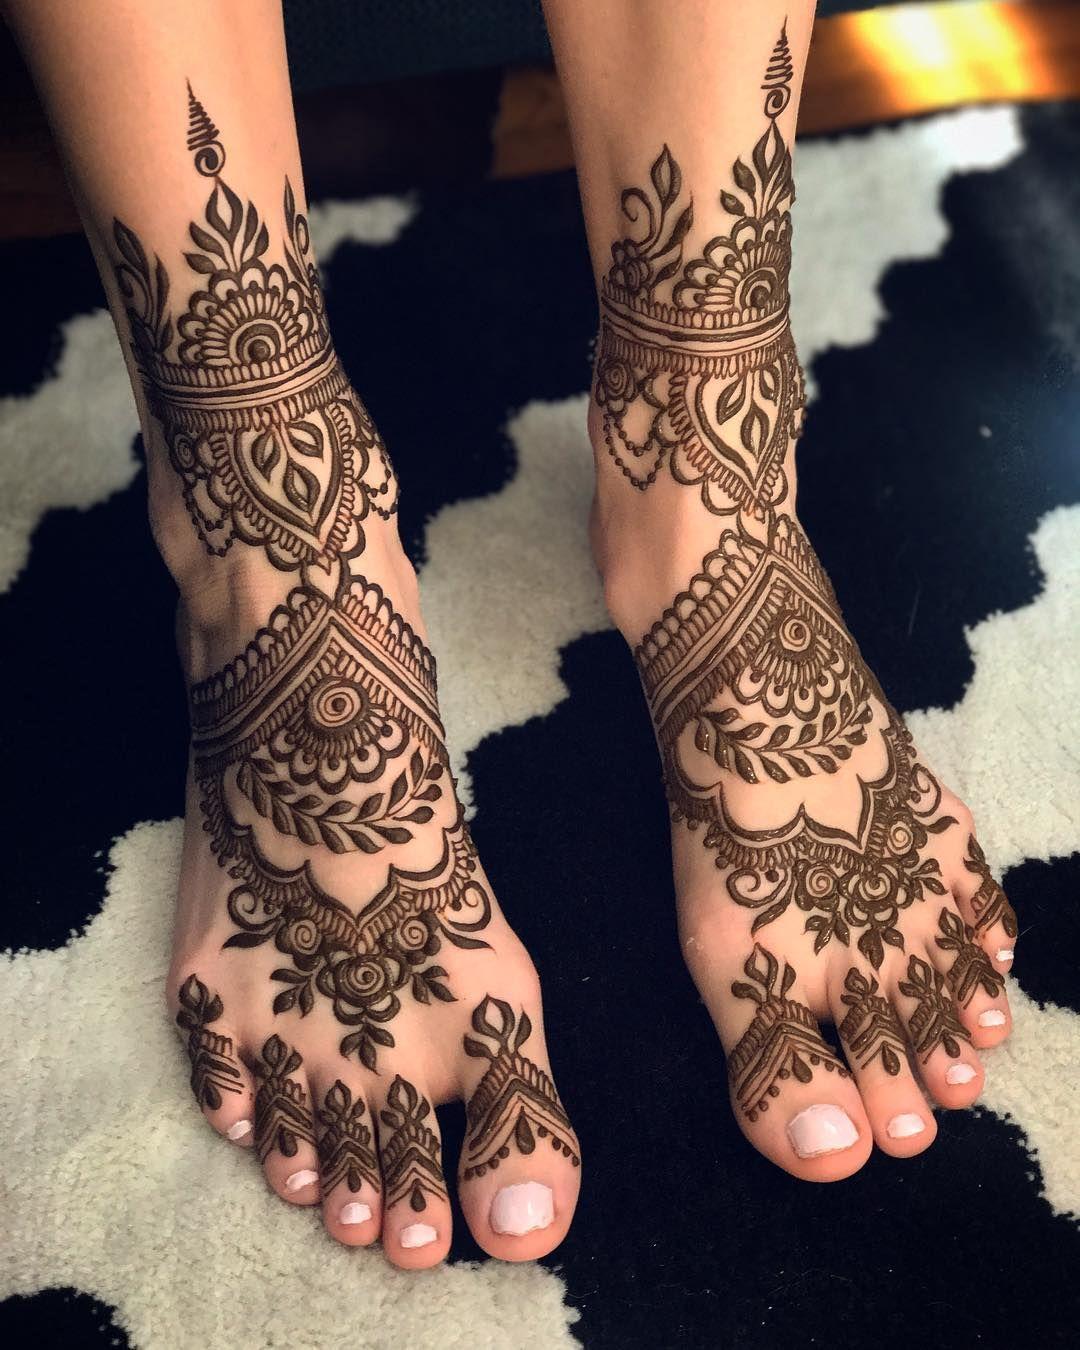 Pin By Livia Taslim On Henna Henna Tattoo Designs Henna Henna